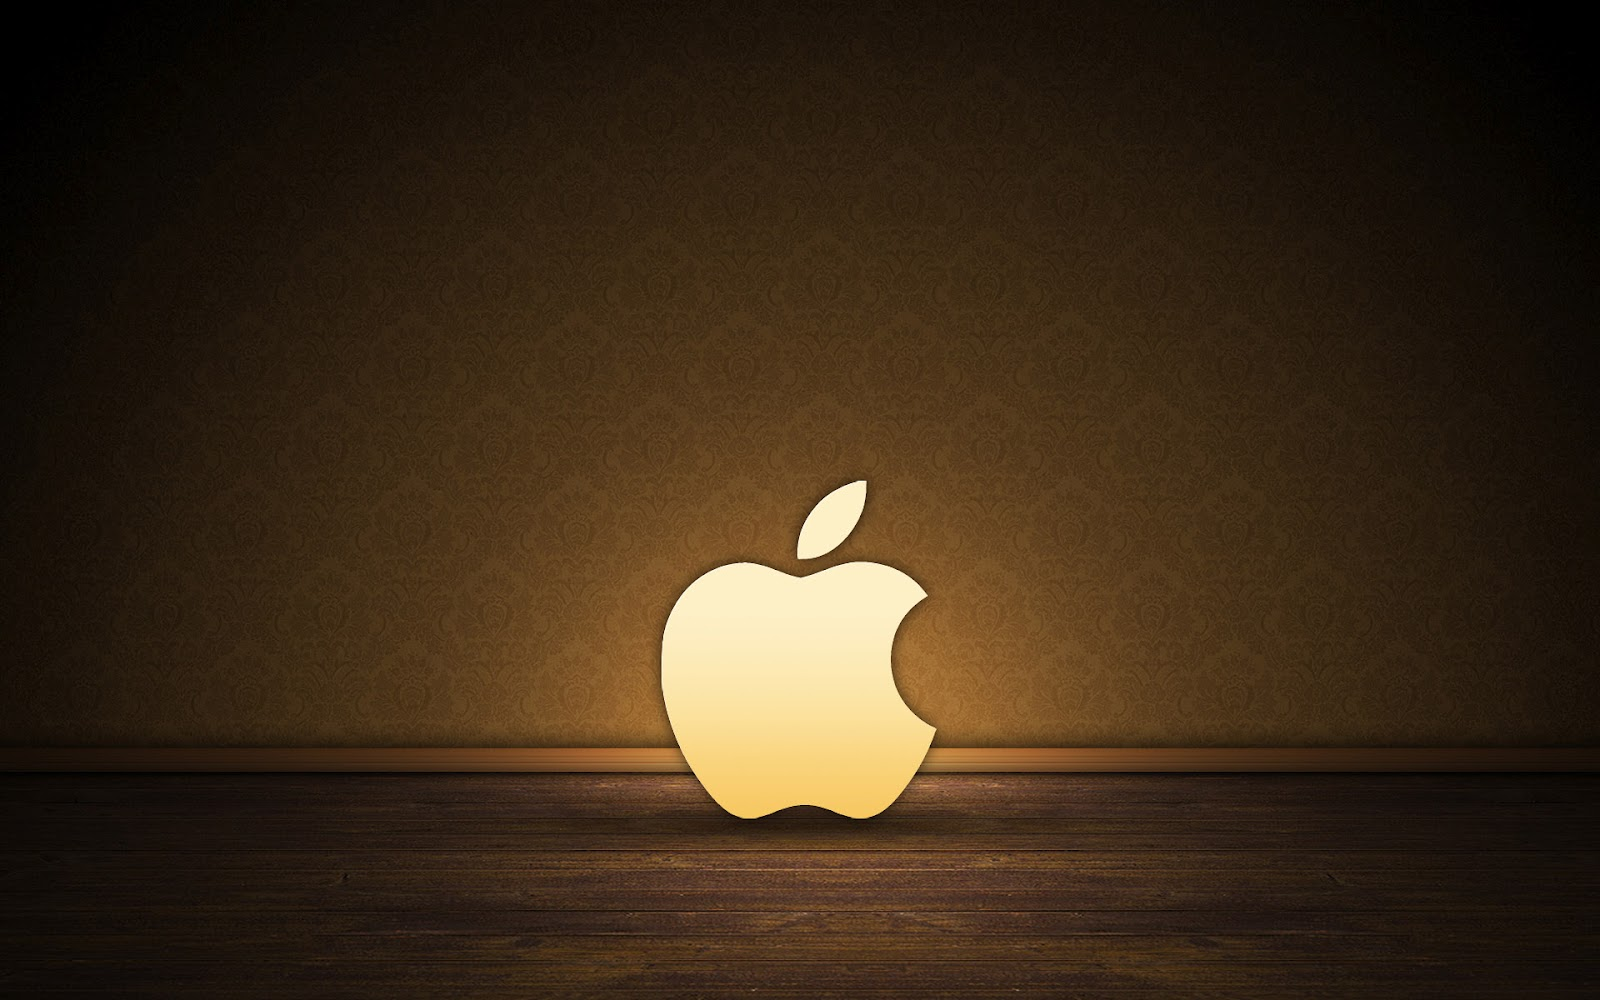 Apple Mac Wallpaper HD